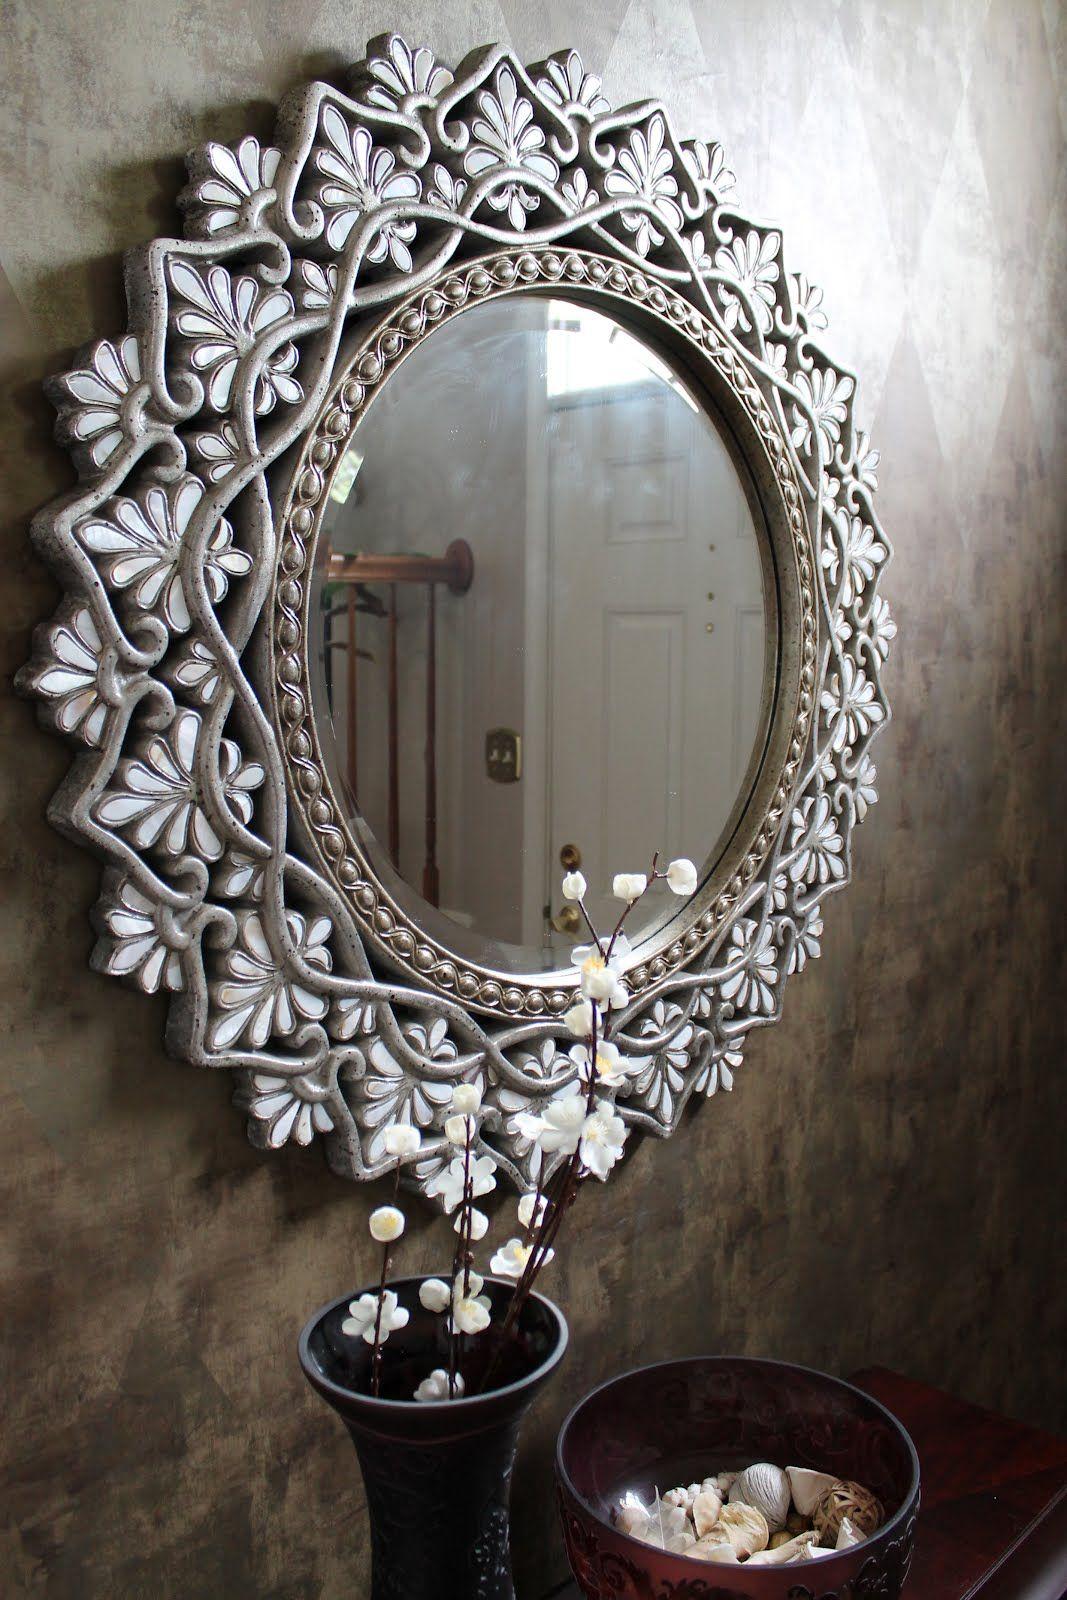 abc mirrors pin round decorative warehouse decor mirror